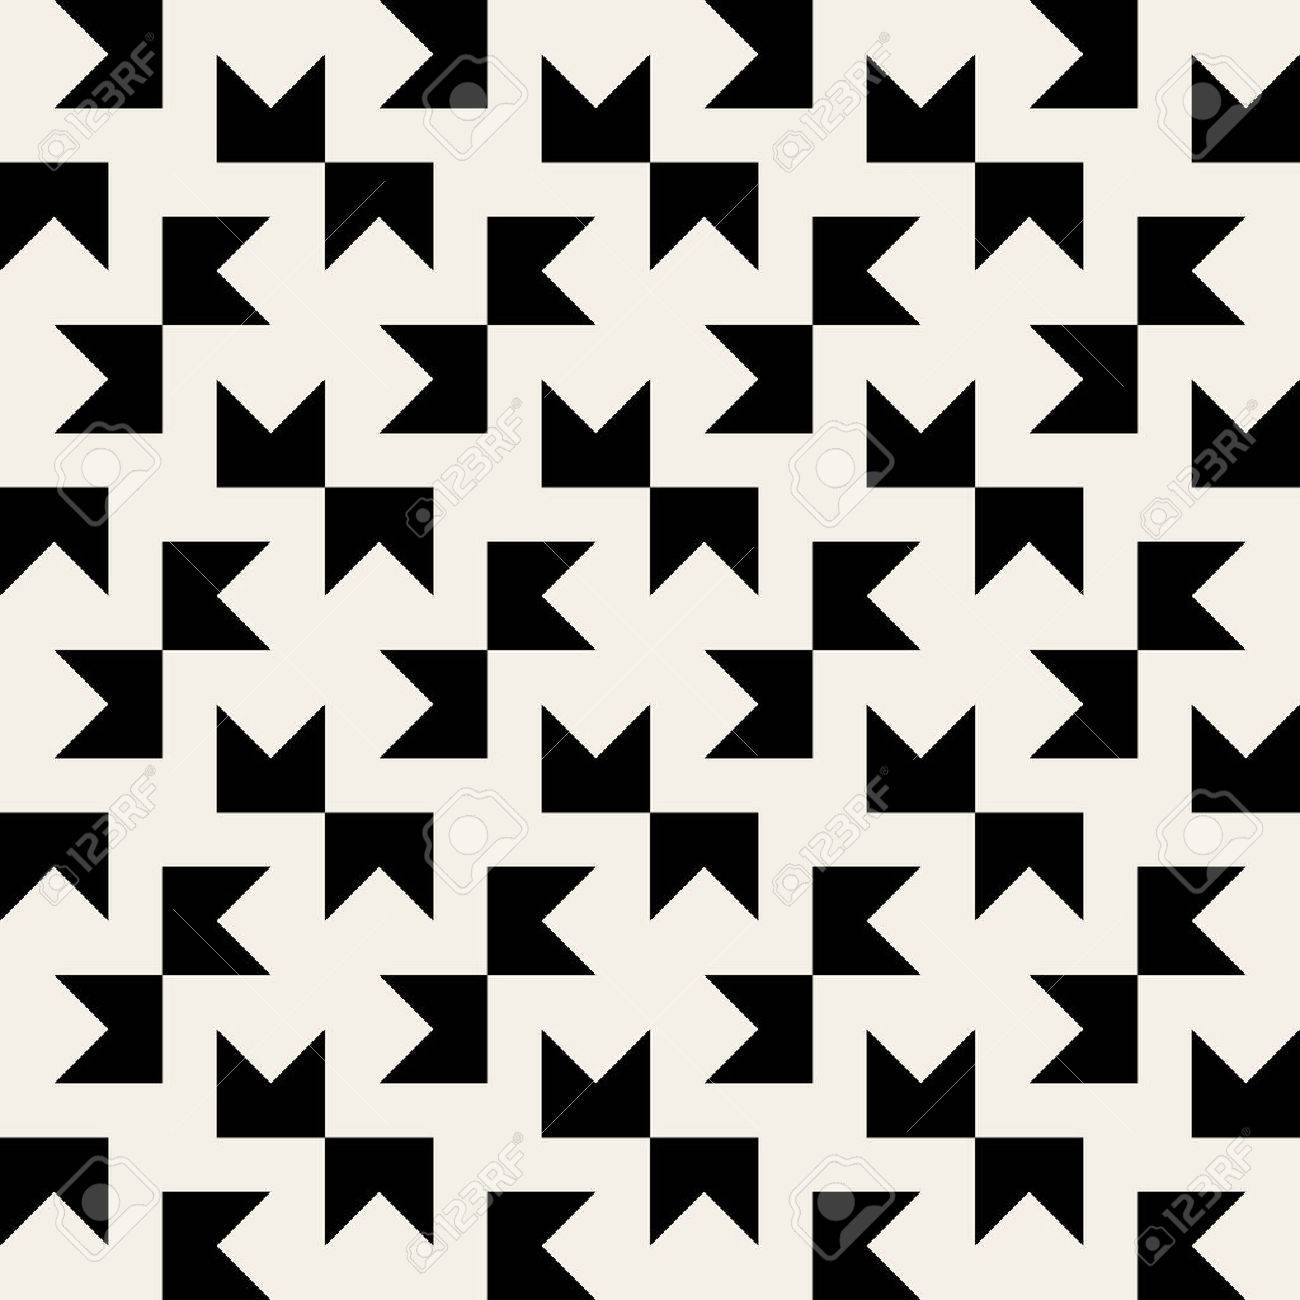 Seamless Black & White Geometric Square Tiling Pattern Background ...